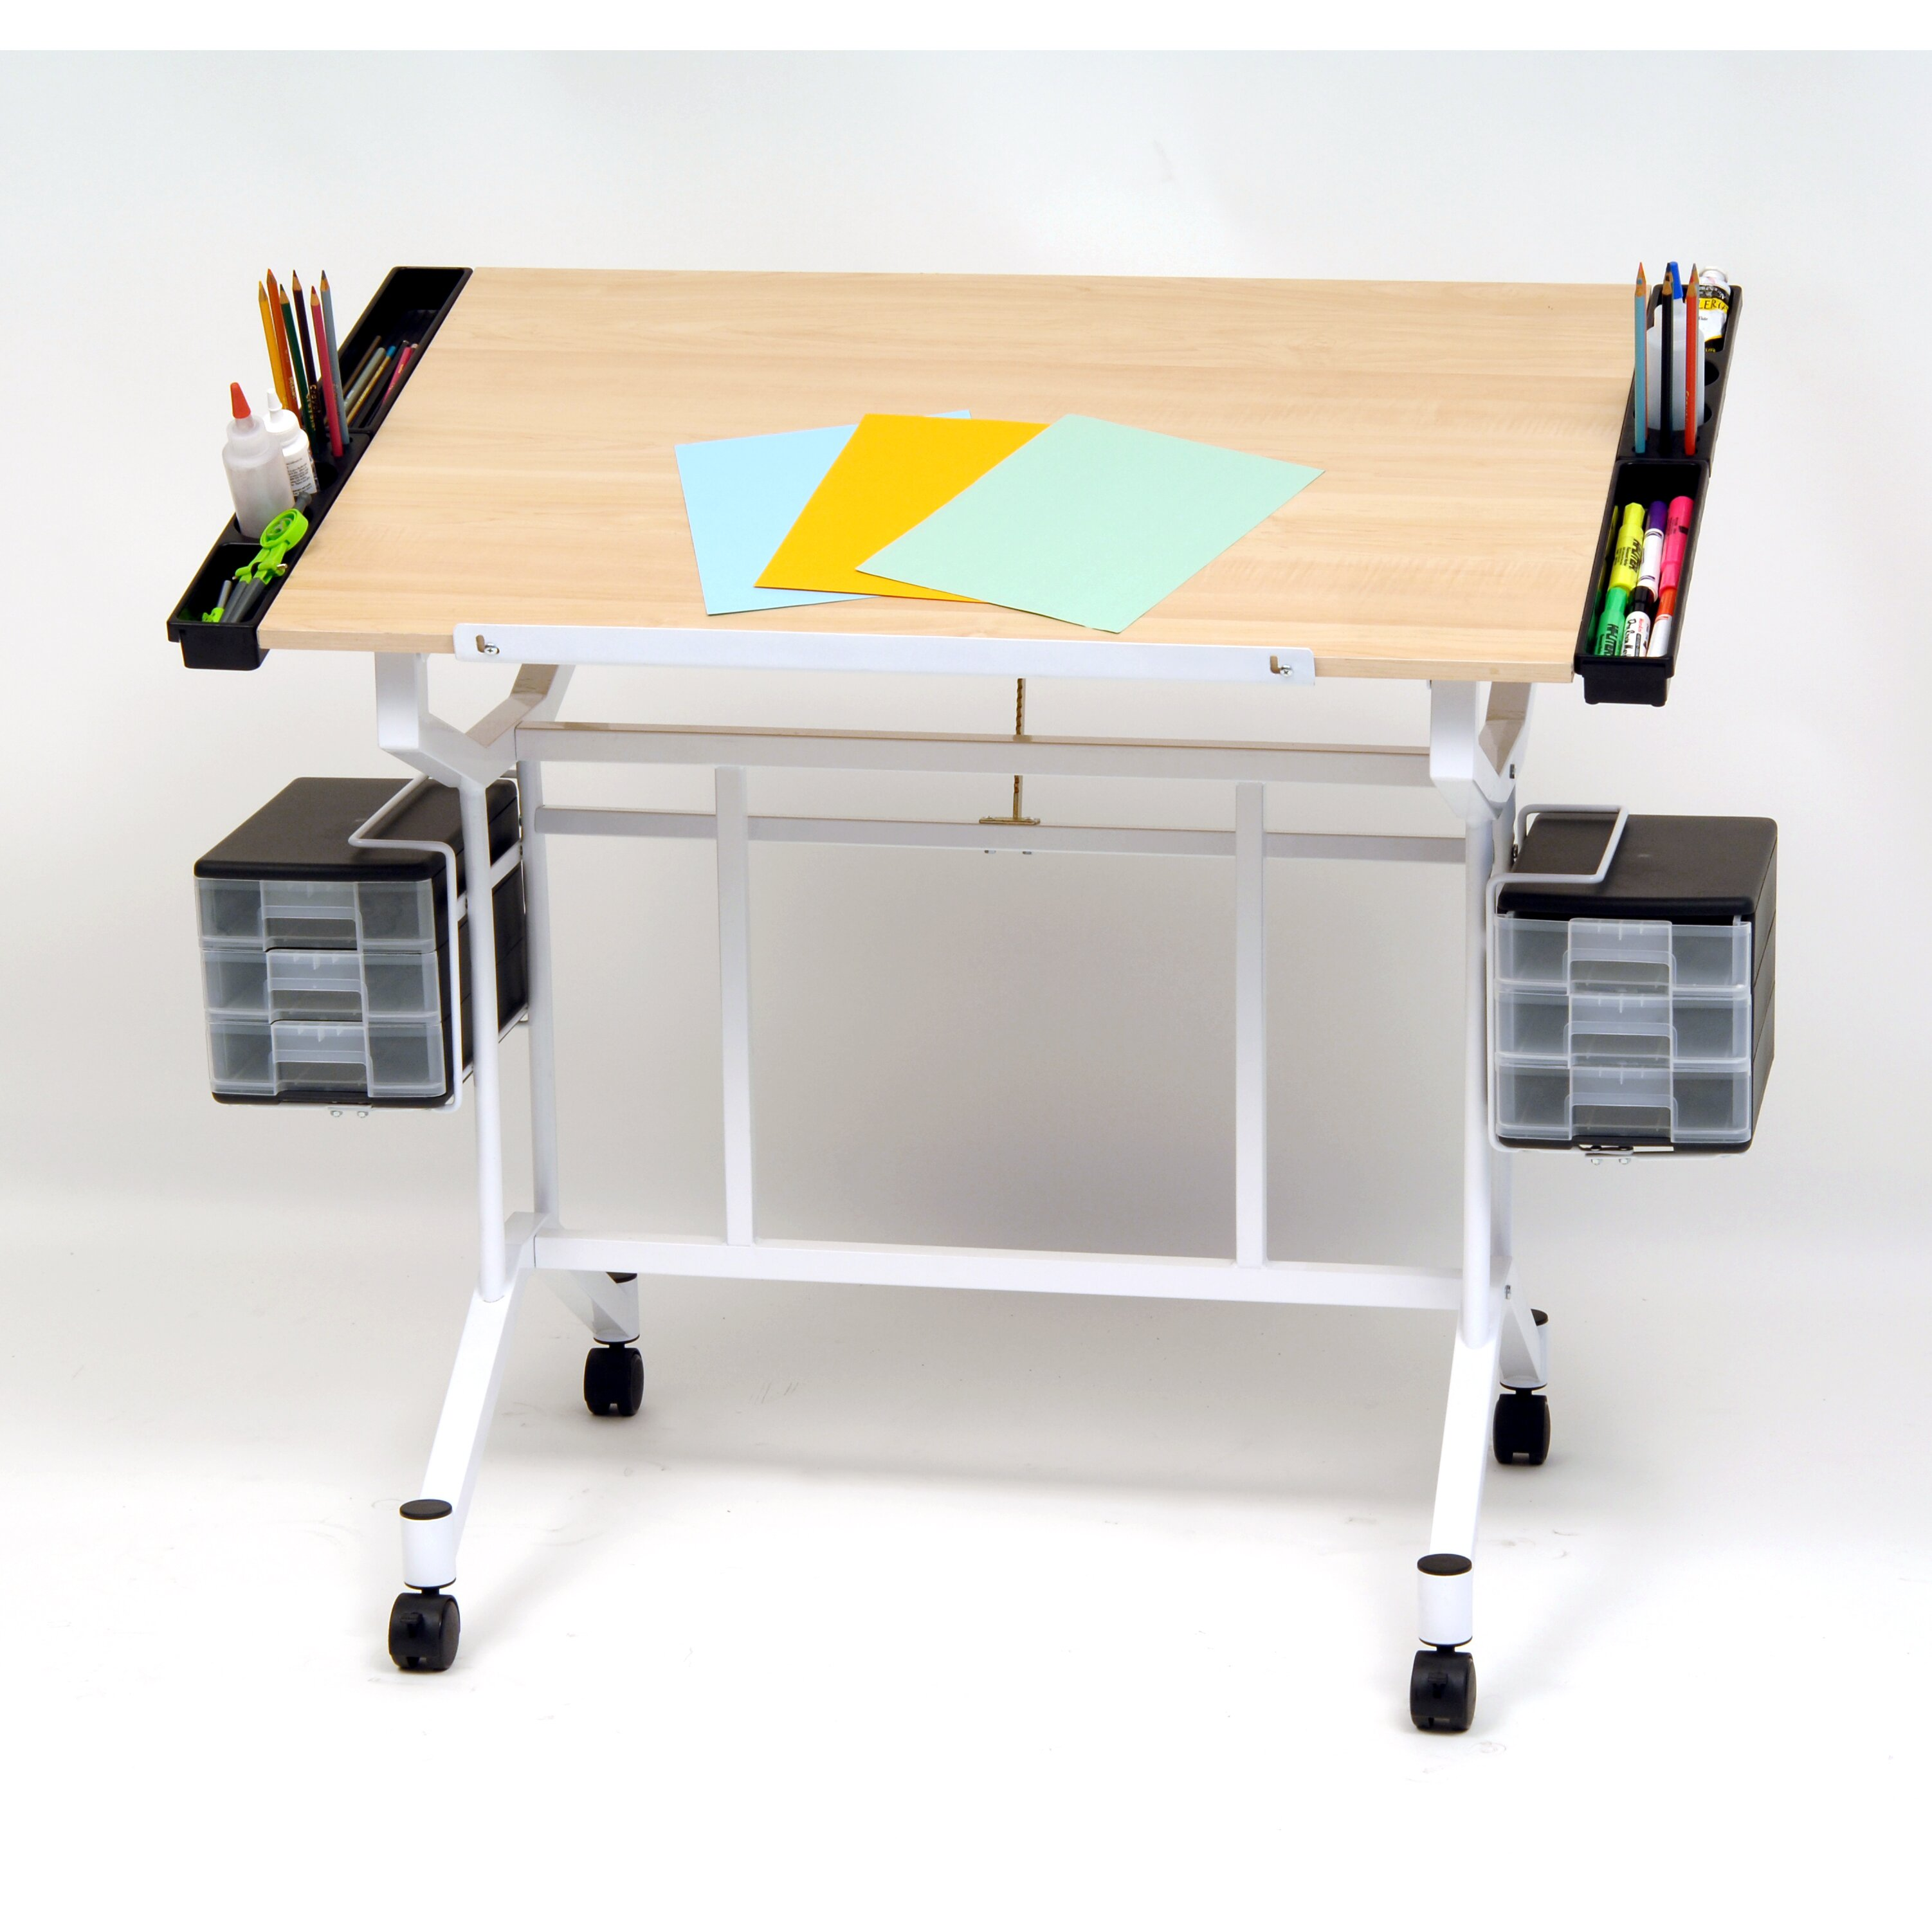 Studio designs pro craft station wood drafting table for Studio designs craft station